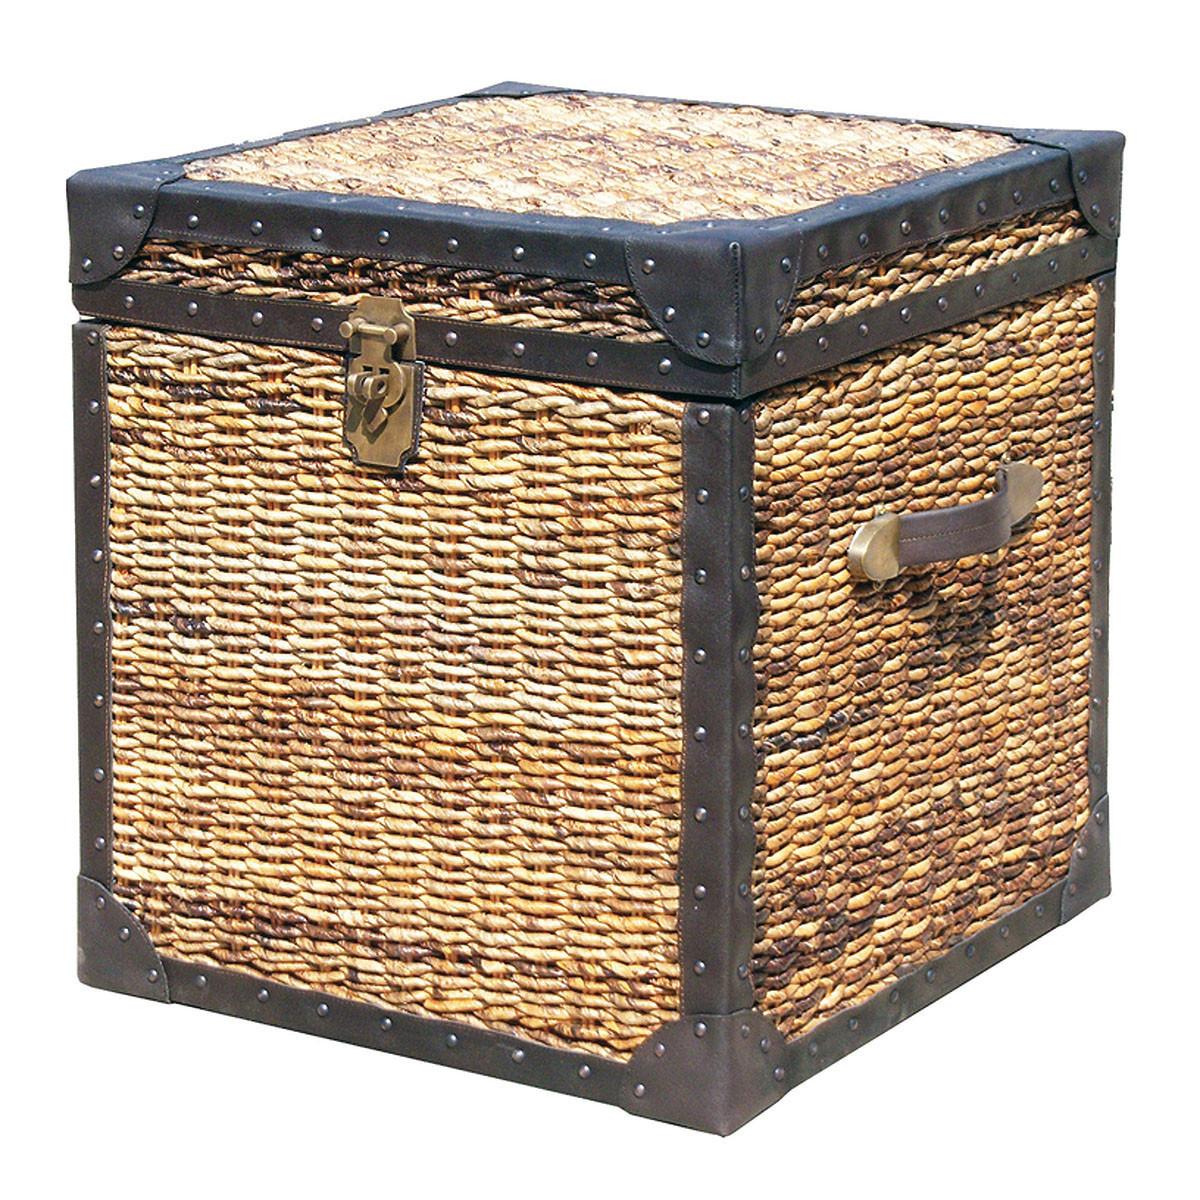 Wicker Bedroom Furniture | Wicker, Rattan & Seagrass Furniture ...